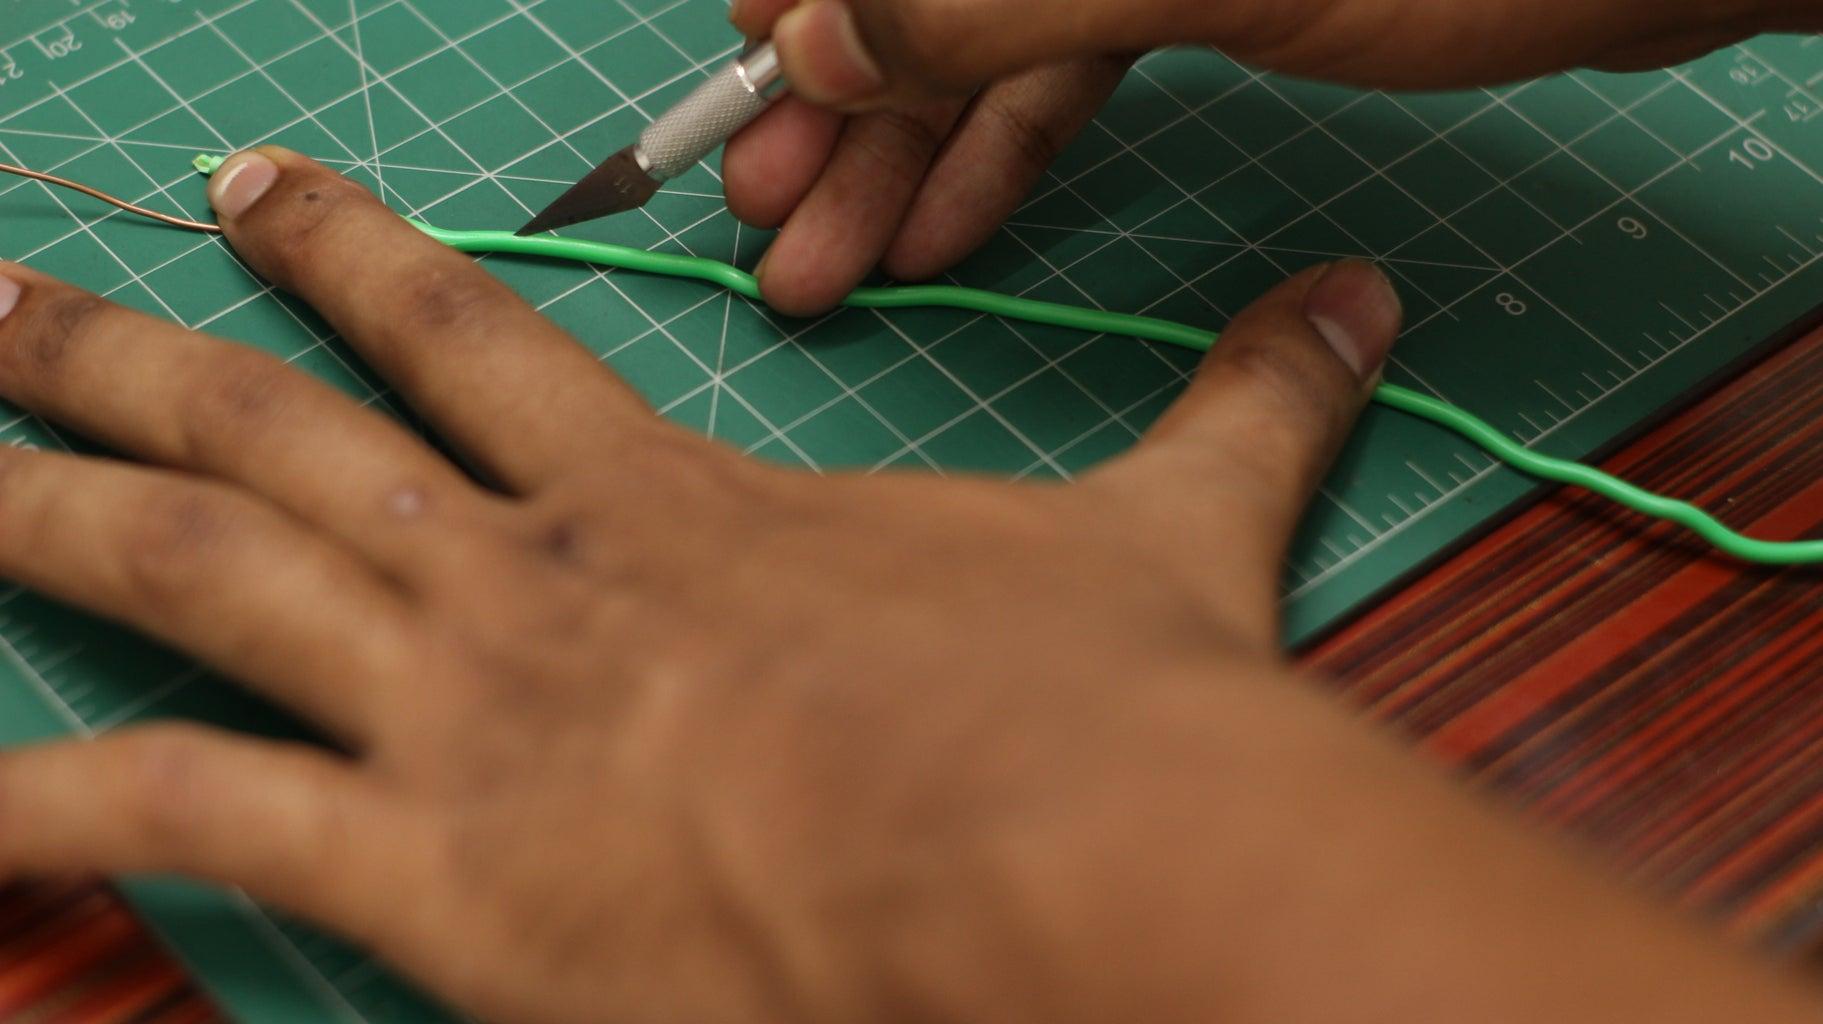 Strip the Wire Insulation